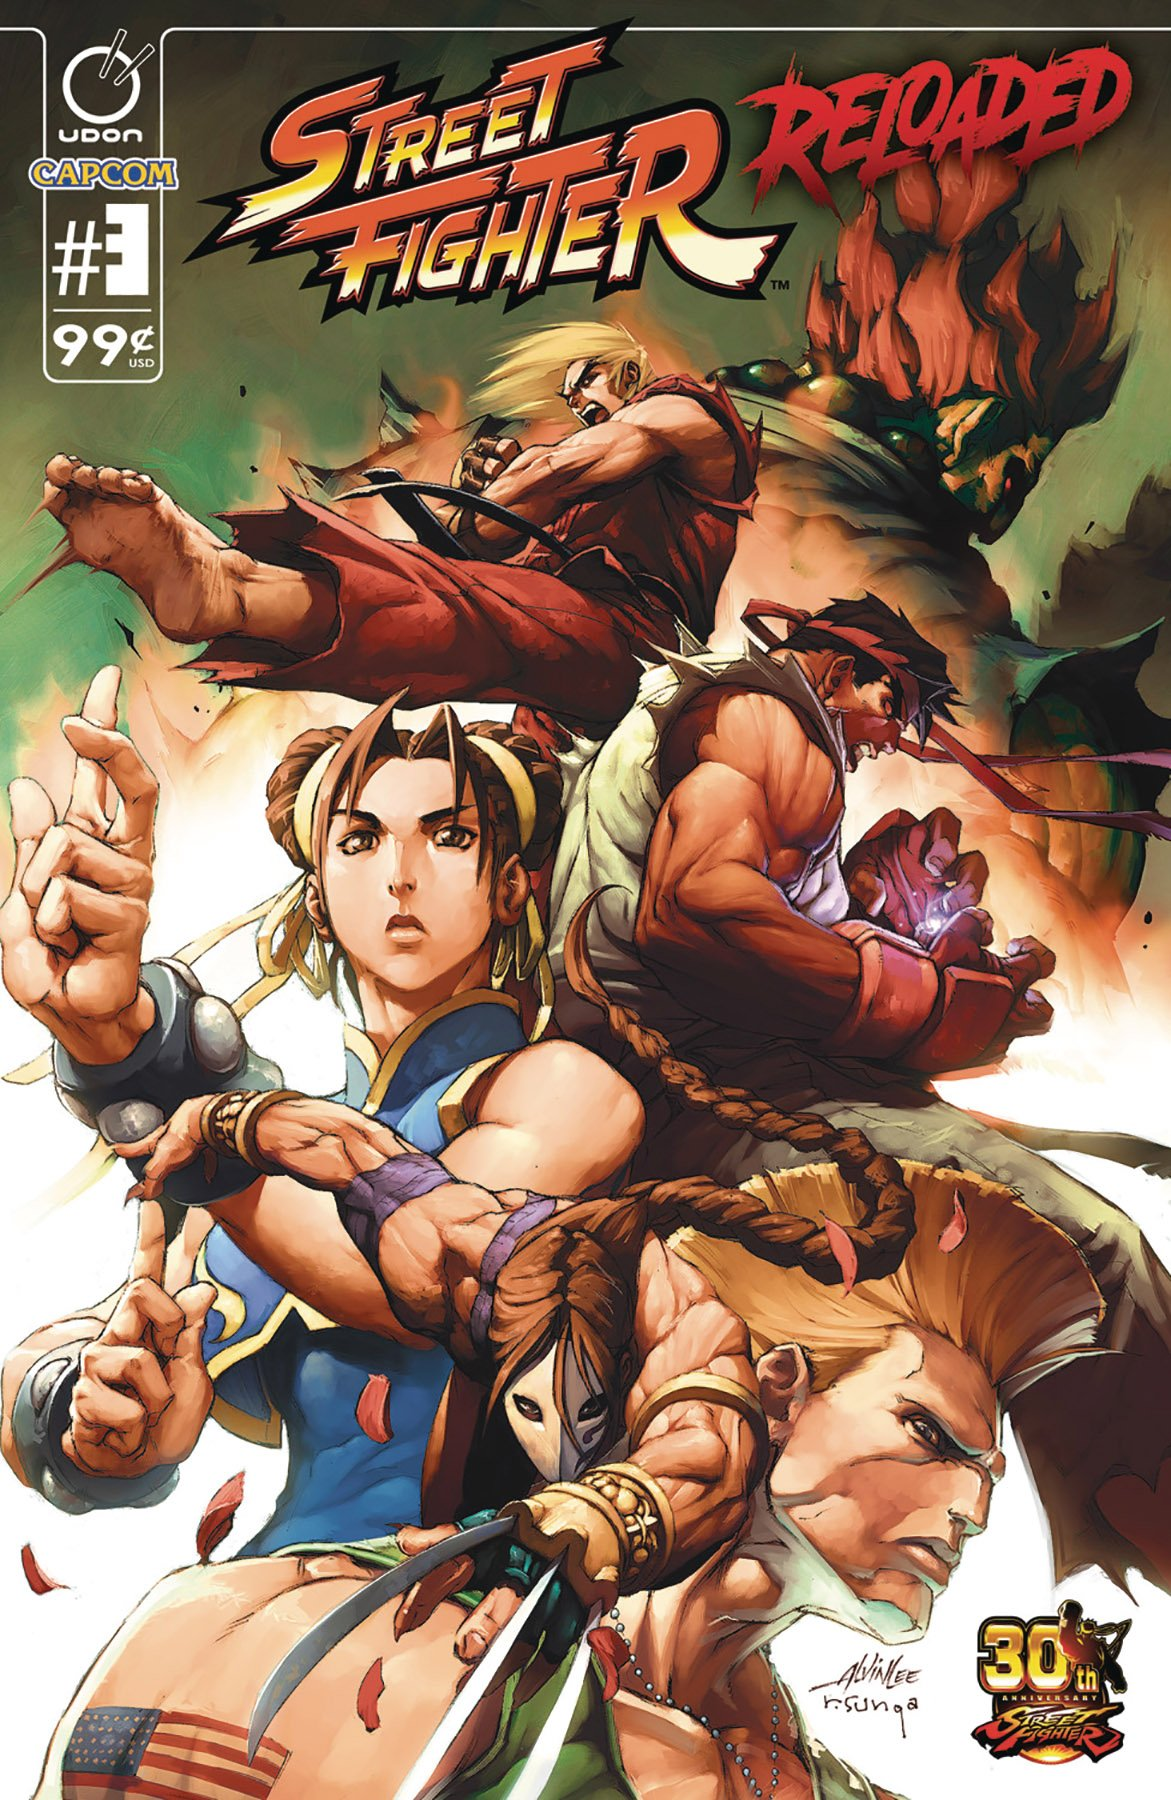 Street Fighter Reloaded 03